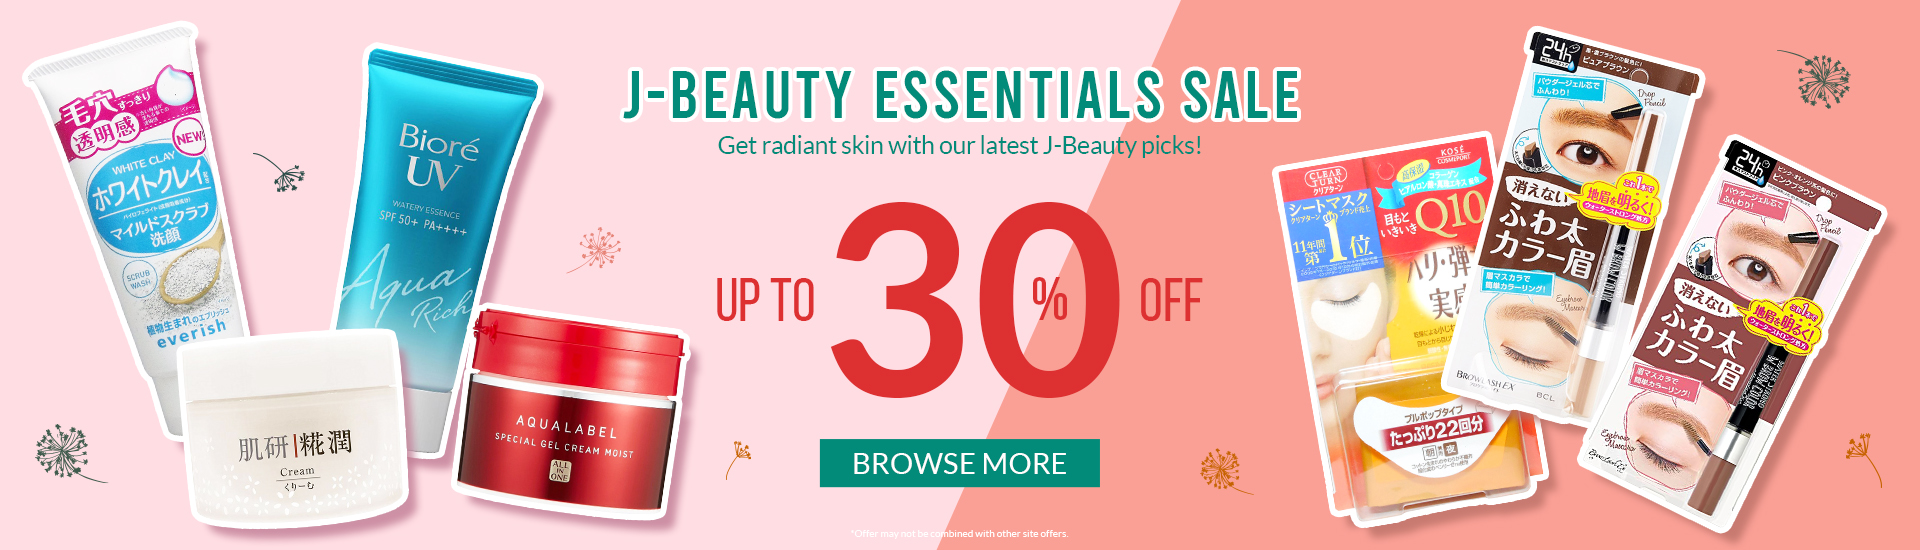 J-Beauty Essentials Sale